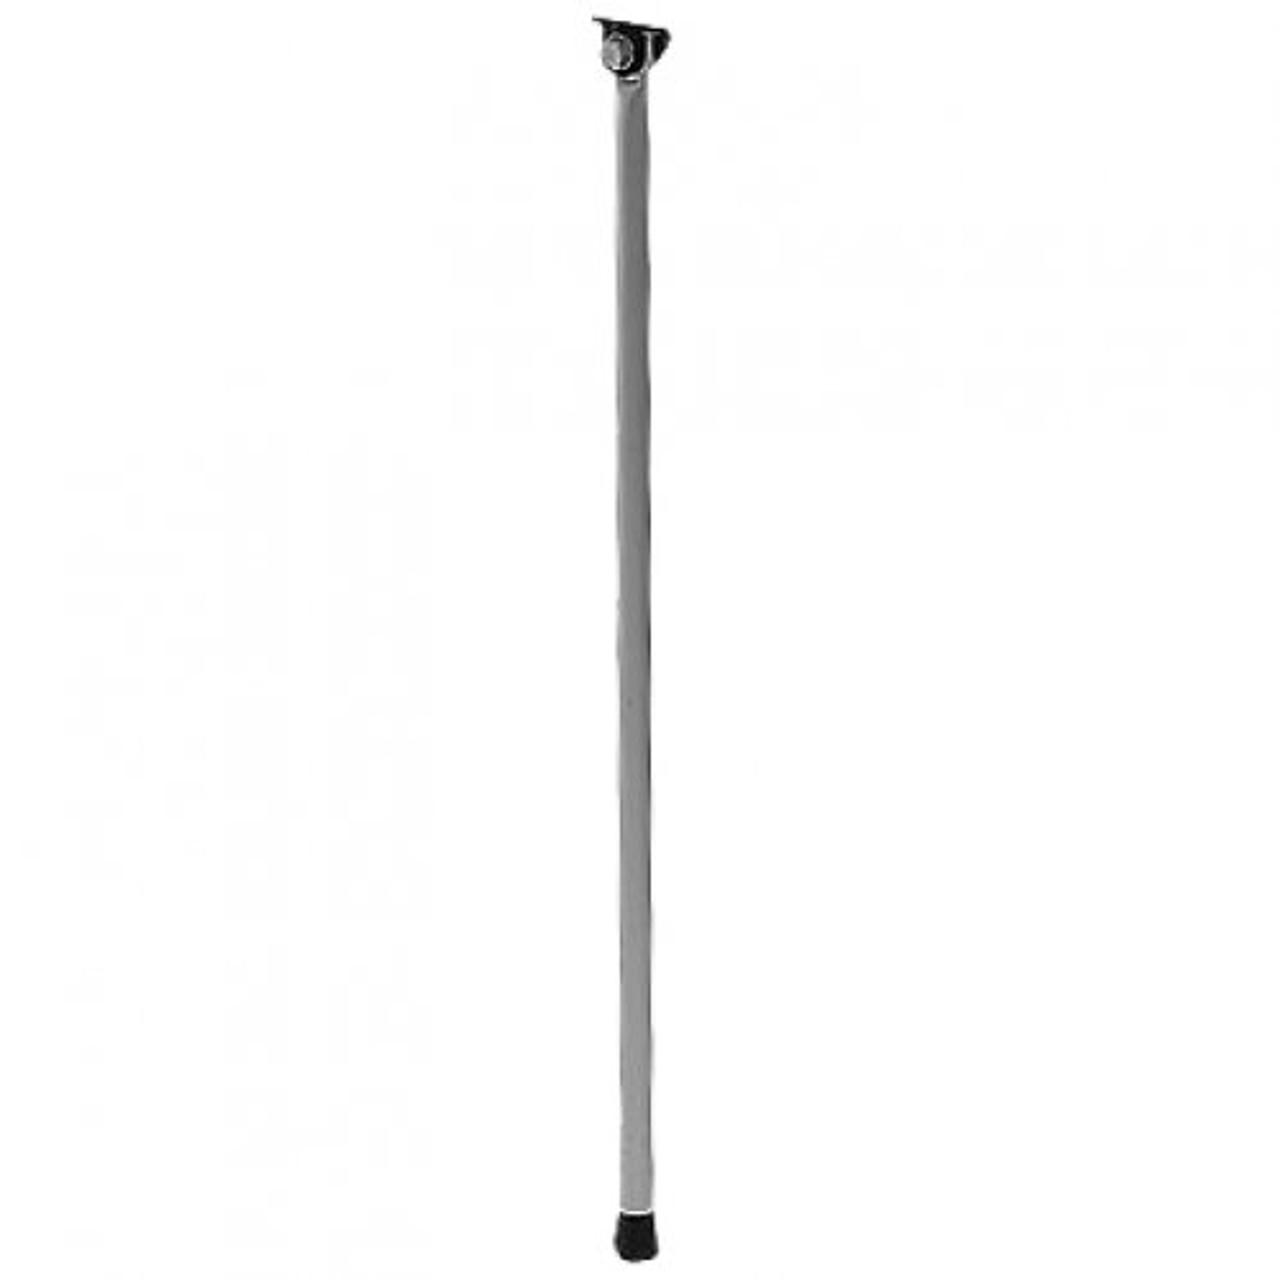 SWINGING ADJUSTABLE LEG FOR MAXIMA ULTRA 35 & 68